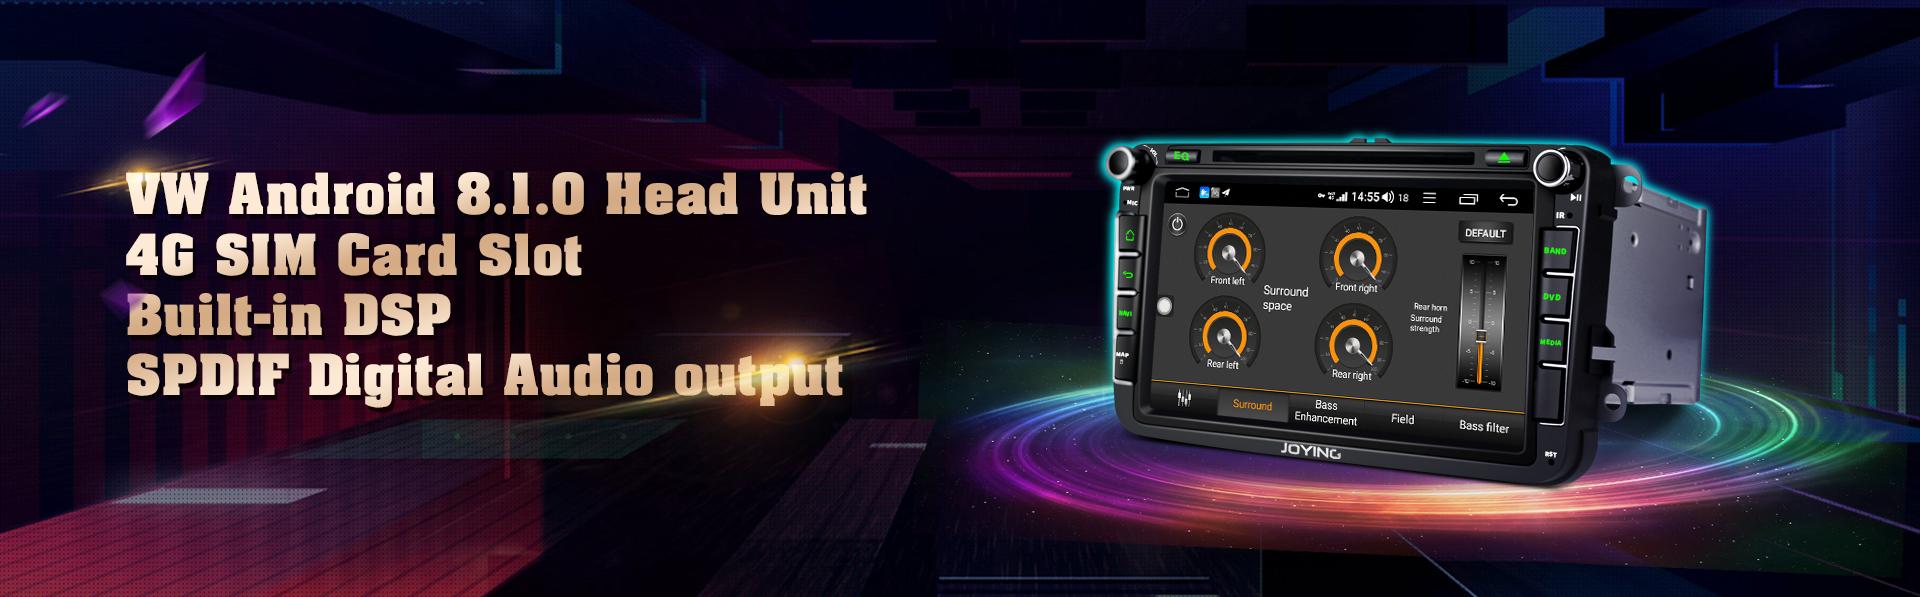 vw autoradio, golf gps navigation system, vw android head unit, vw car stereo